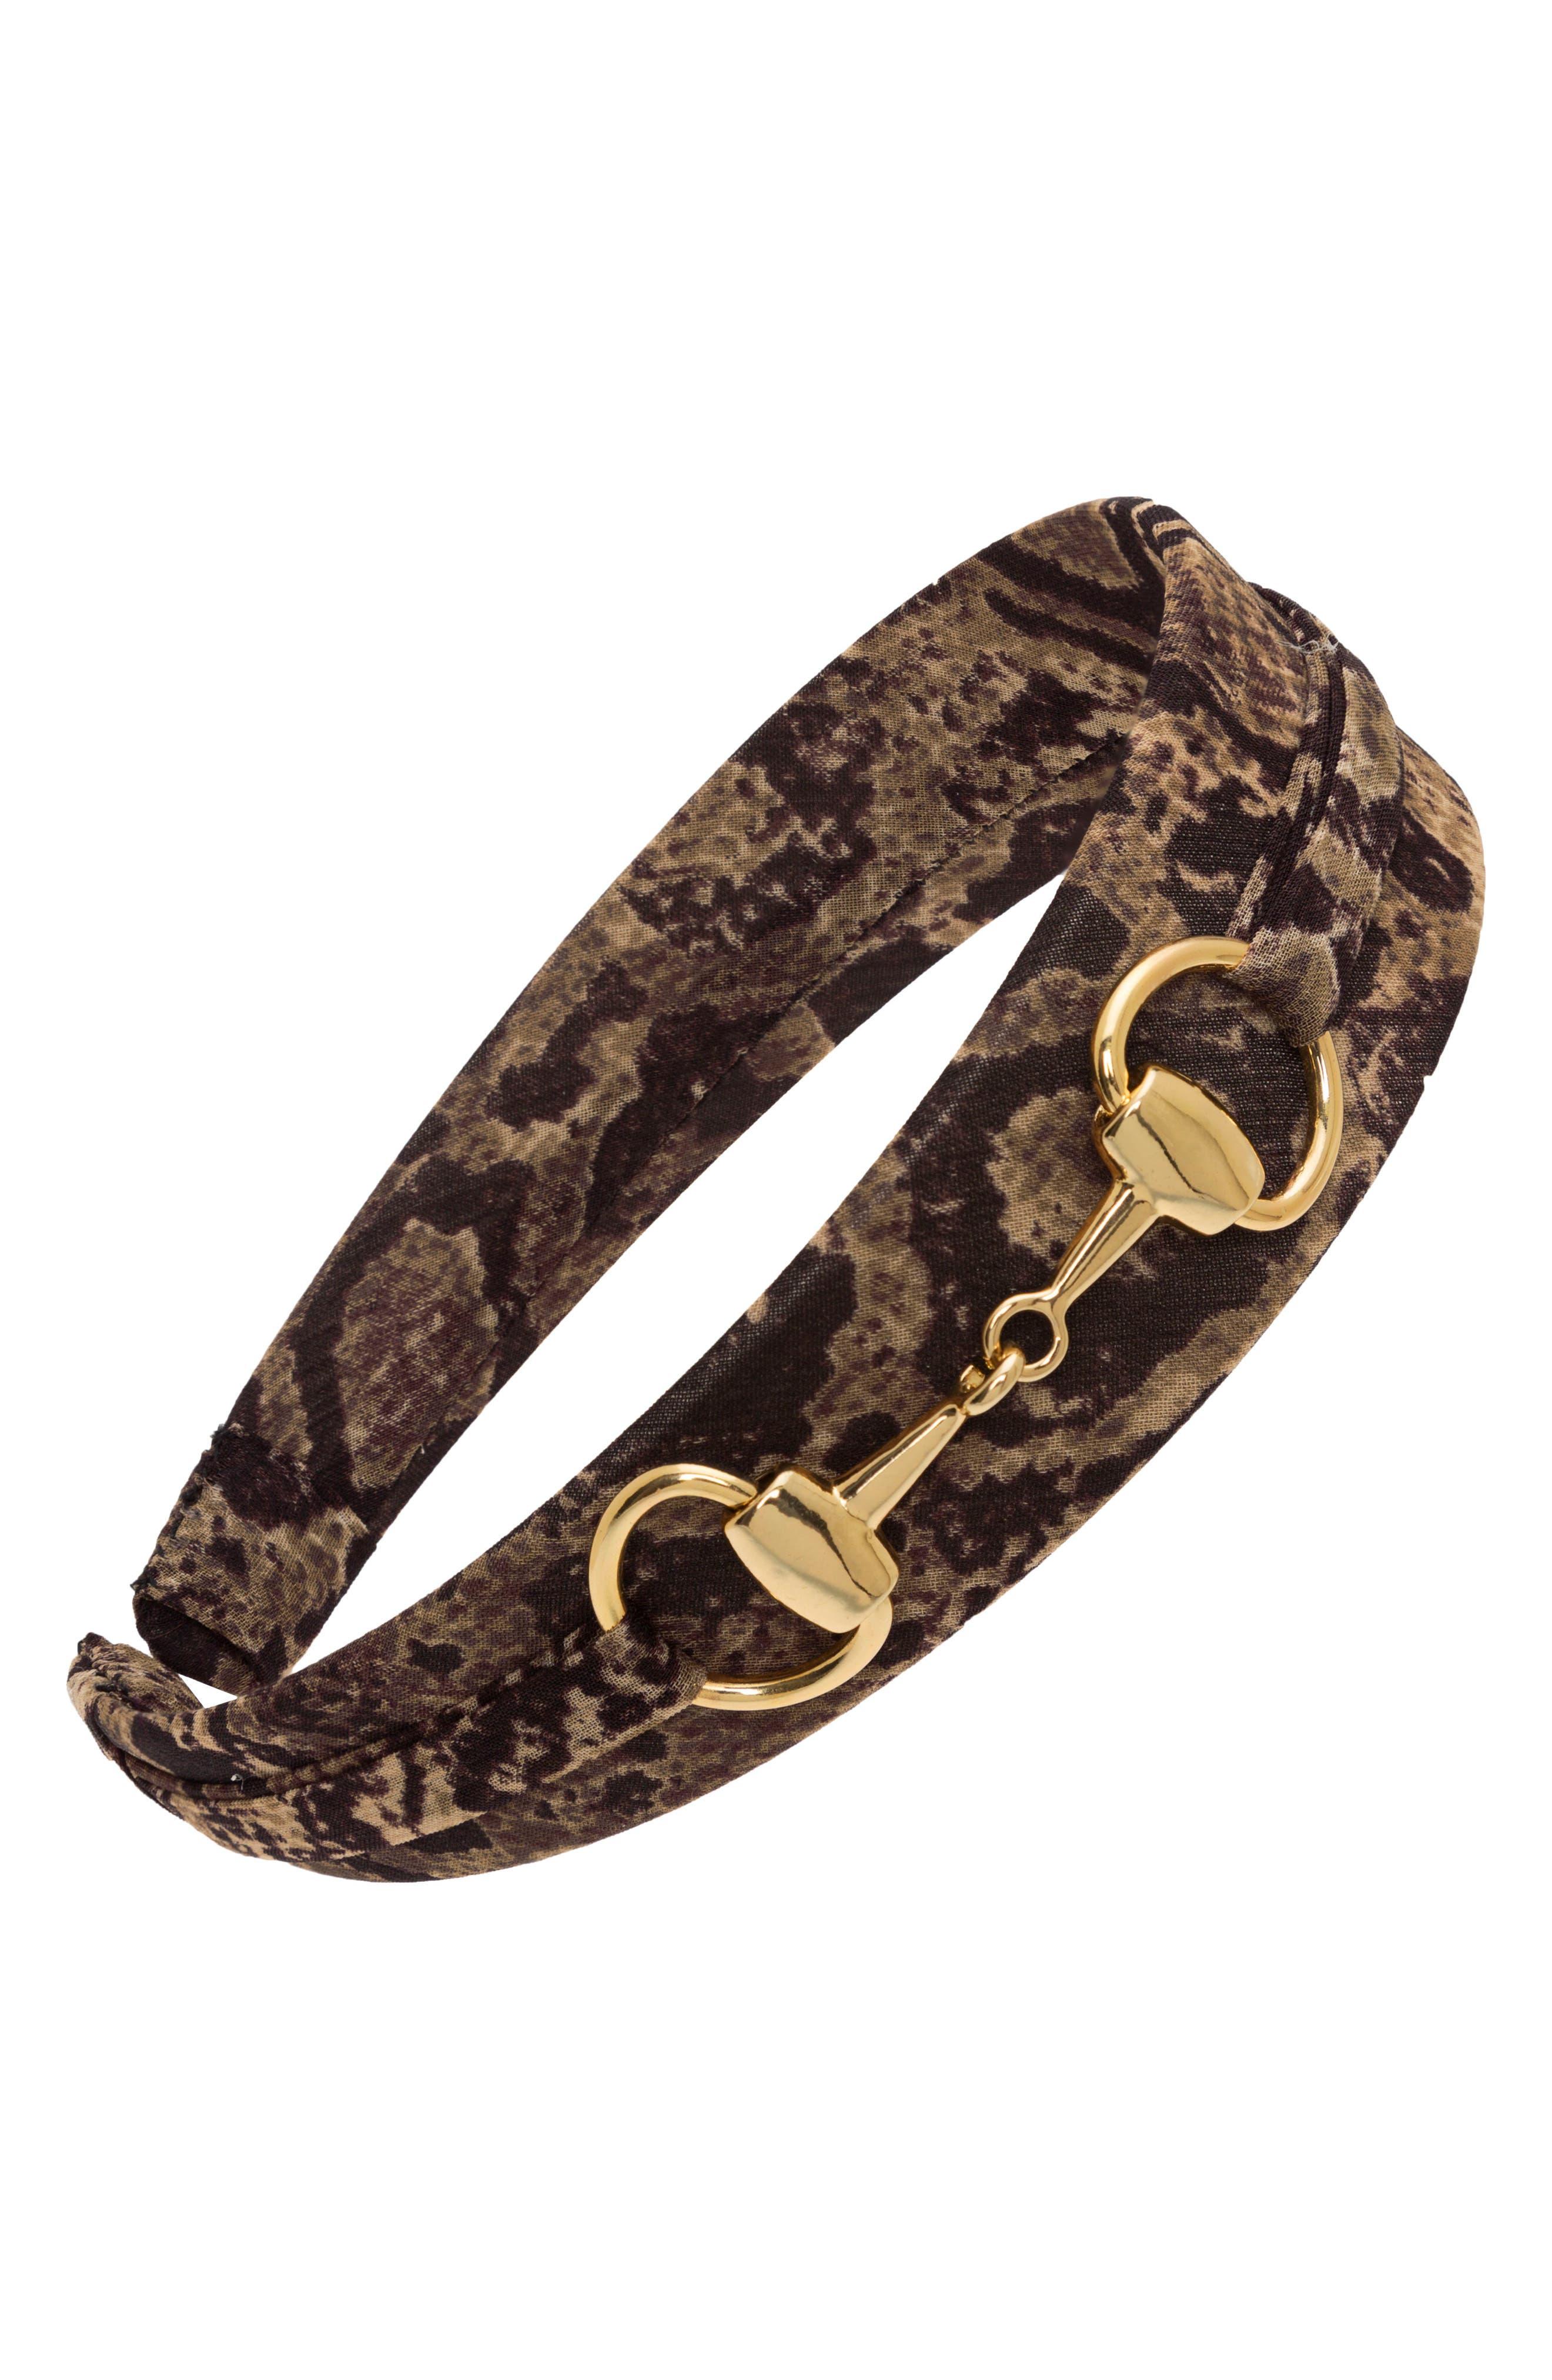 'Bit' Headband,                             Main thumbnail 1, color,                             Serpent Brown